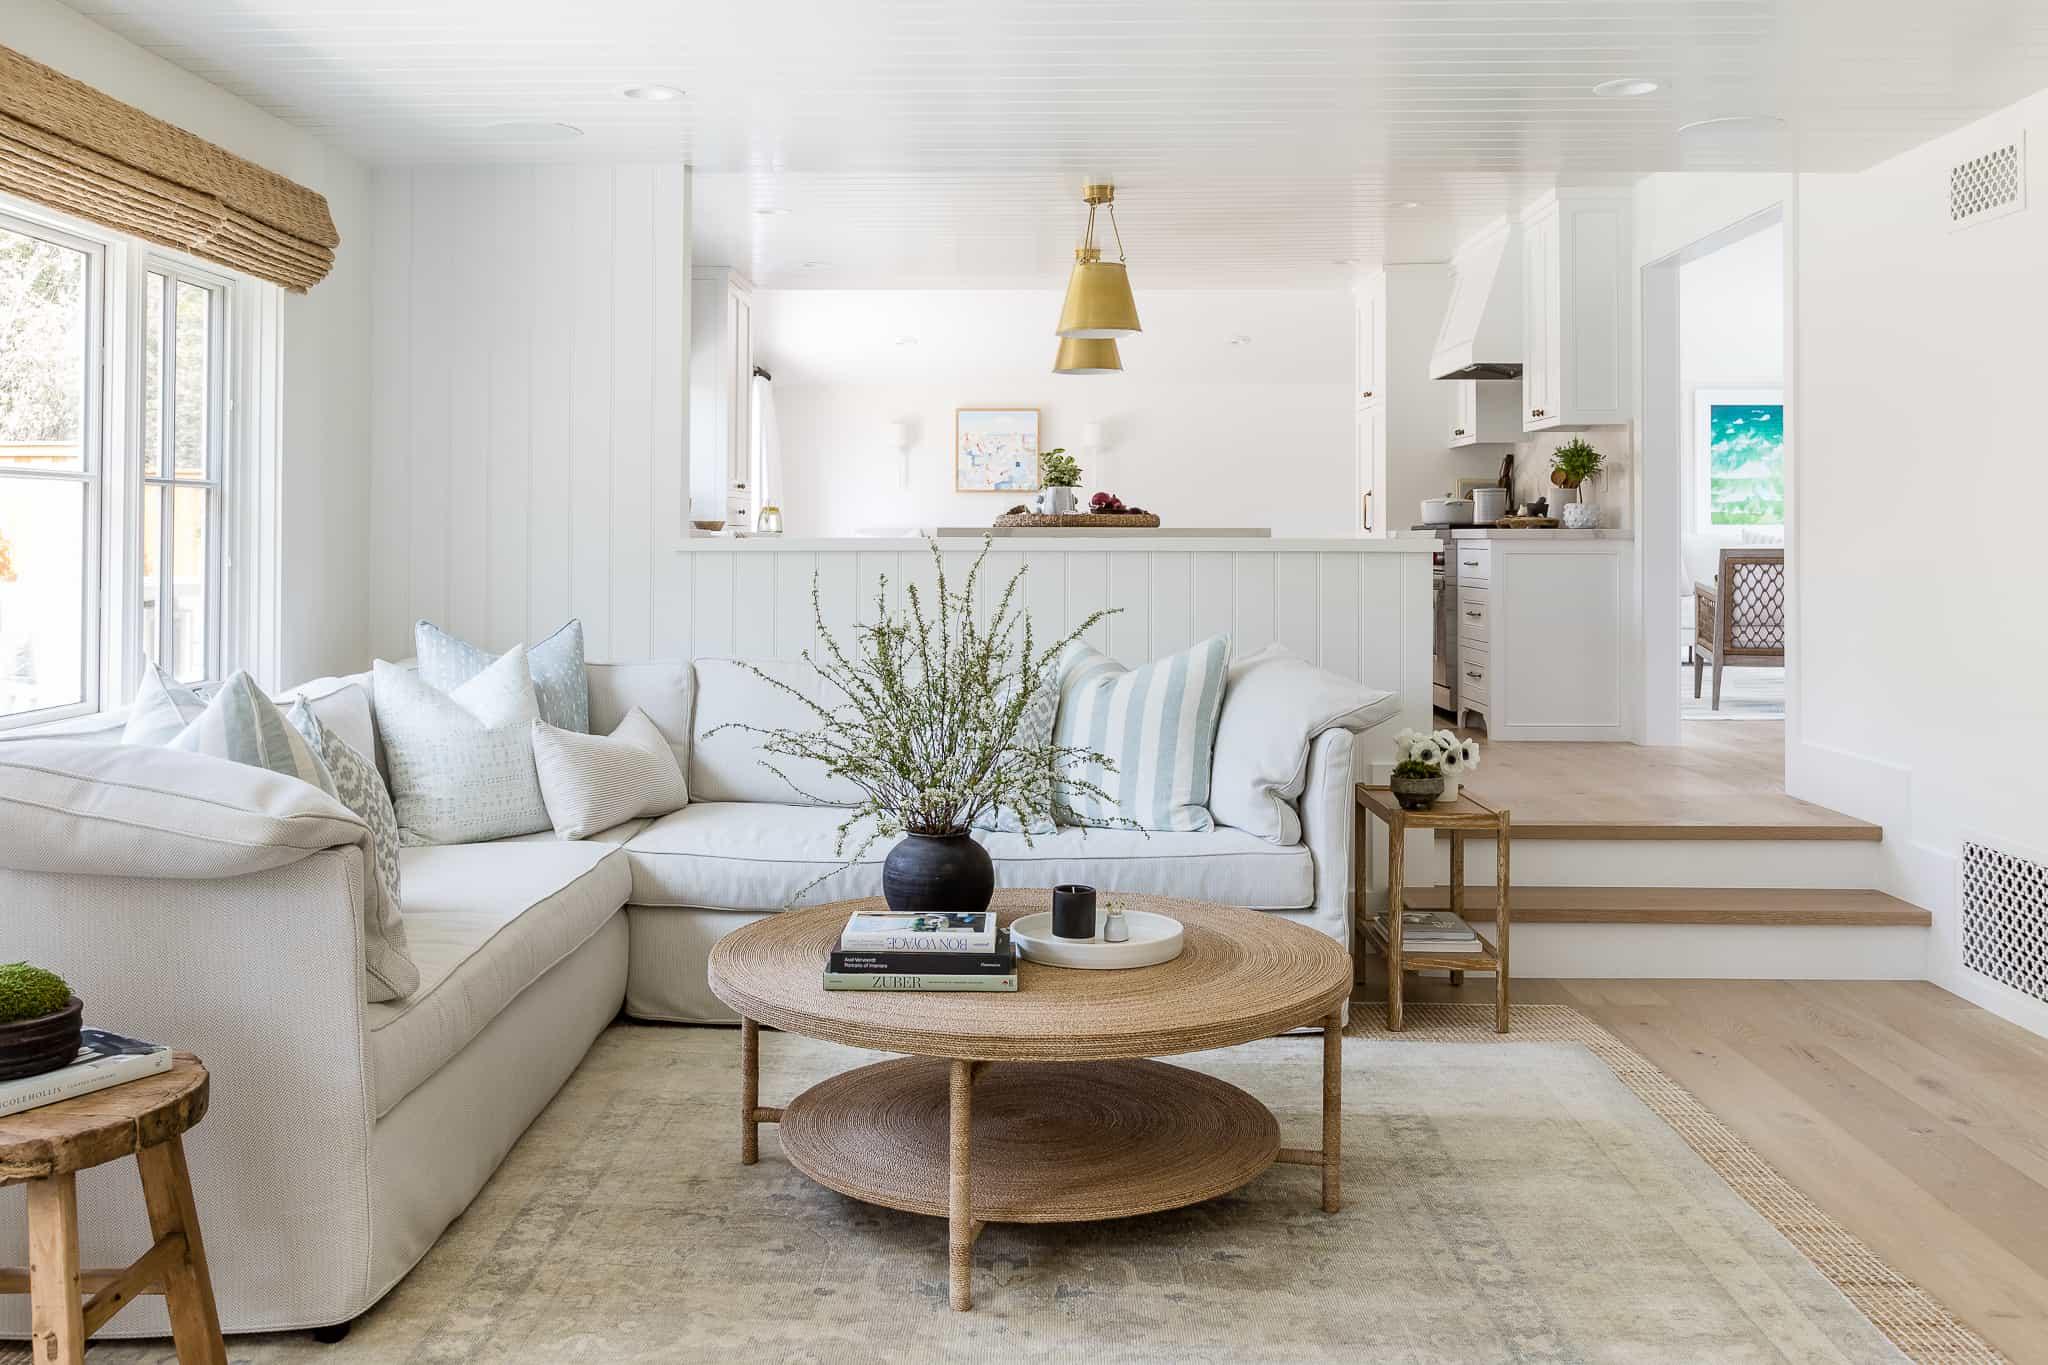 Port Newport Project - Mindy Gayer Design Co. - Coastal Family Home Living Room